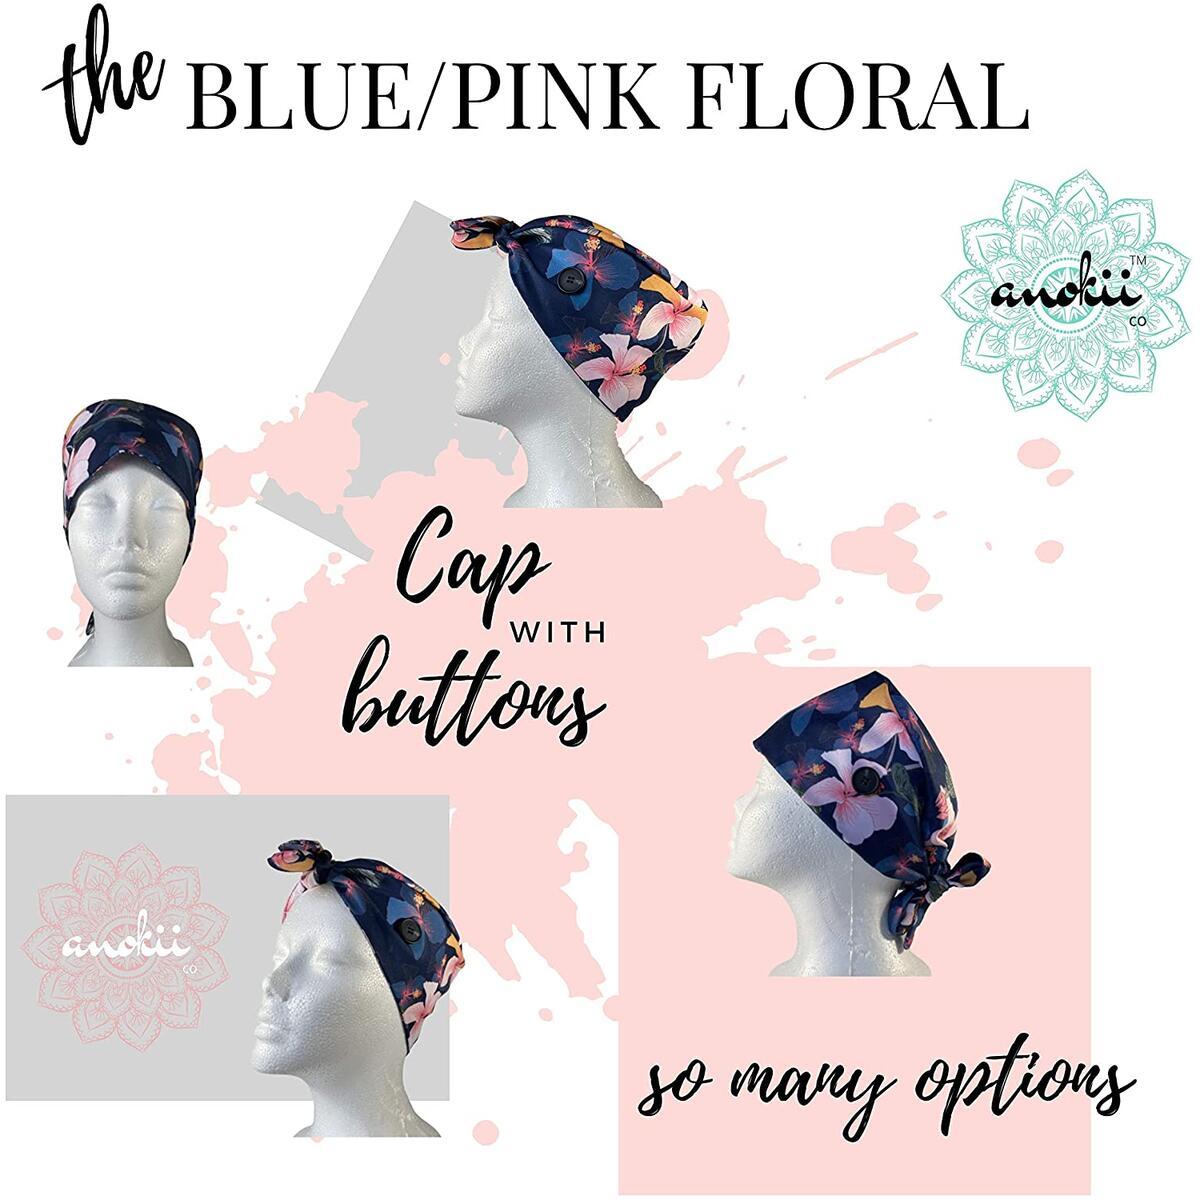 ANOKII CO Head Cover Cap- Premium Adjustable Hair Caps for Men Women w/Buttons